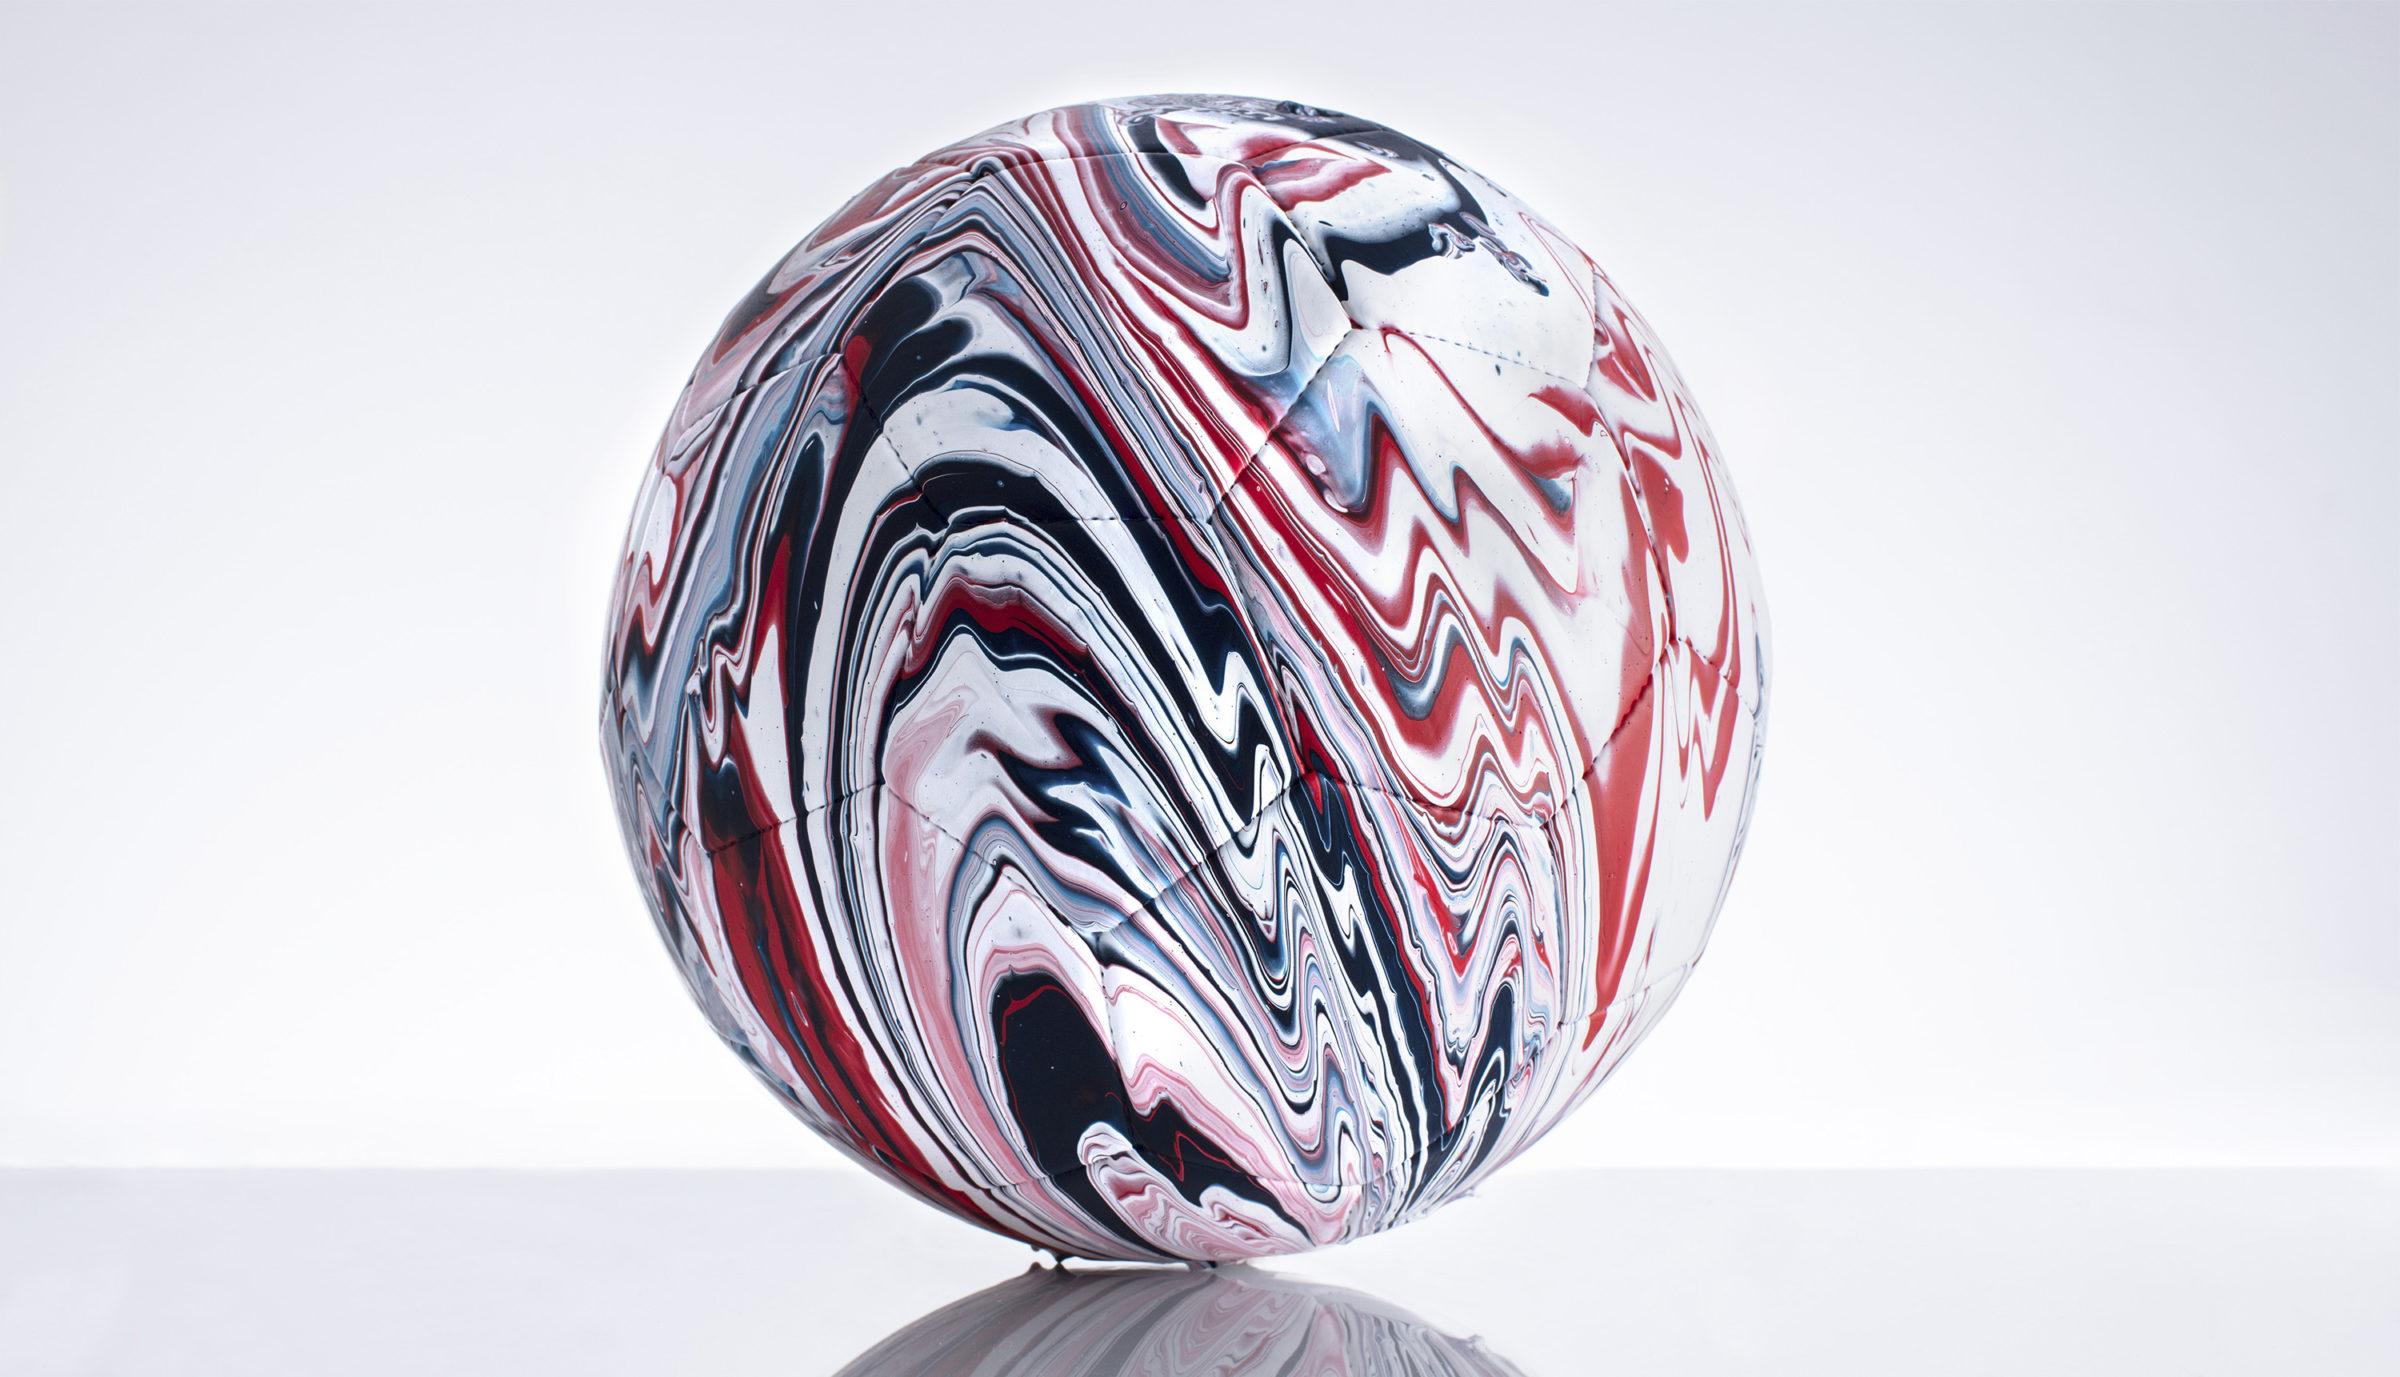 Craig Black x The Fusion Series Footballs Acrylic Fusion Football Art Installation 04 England